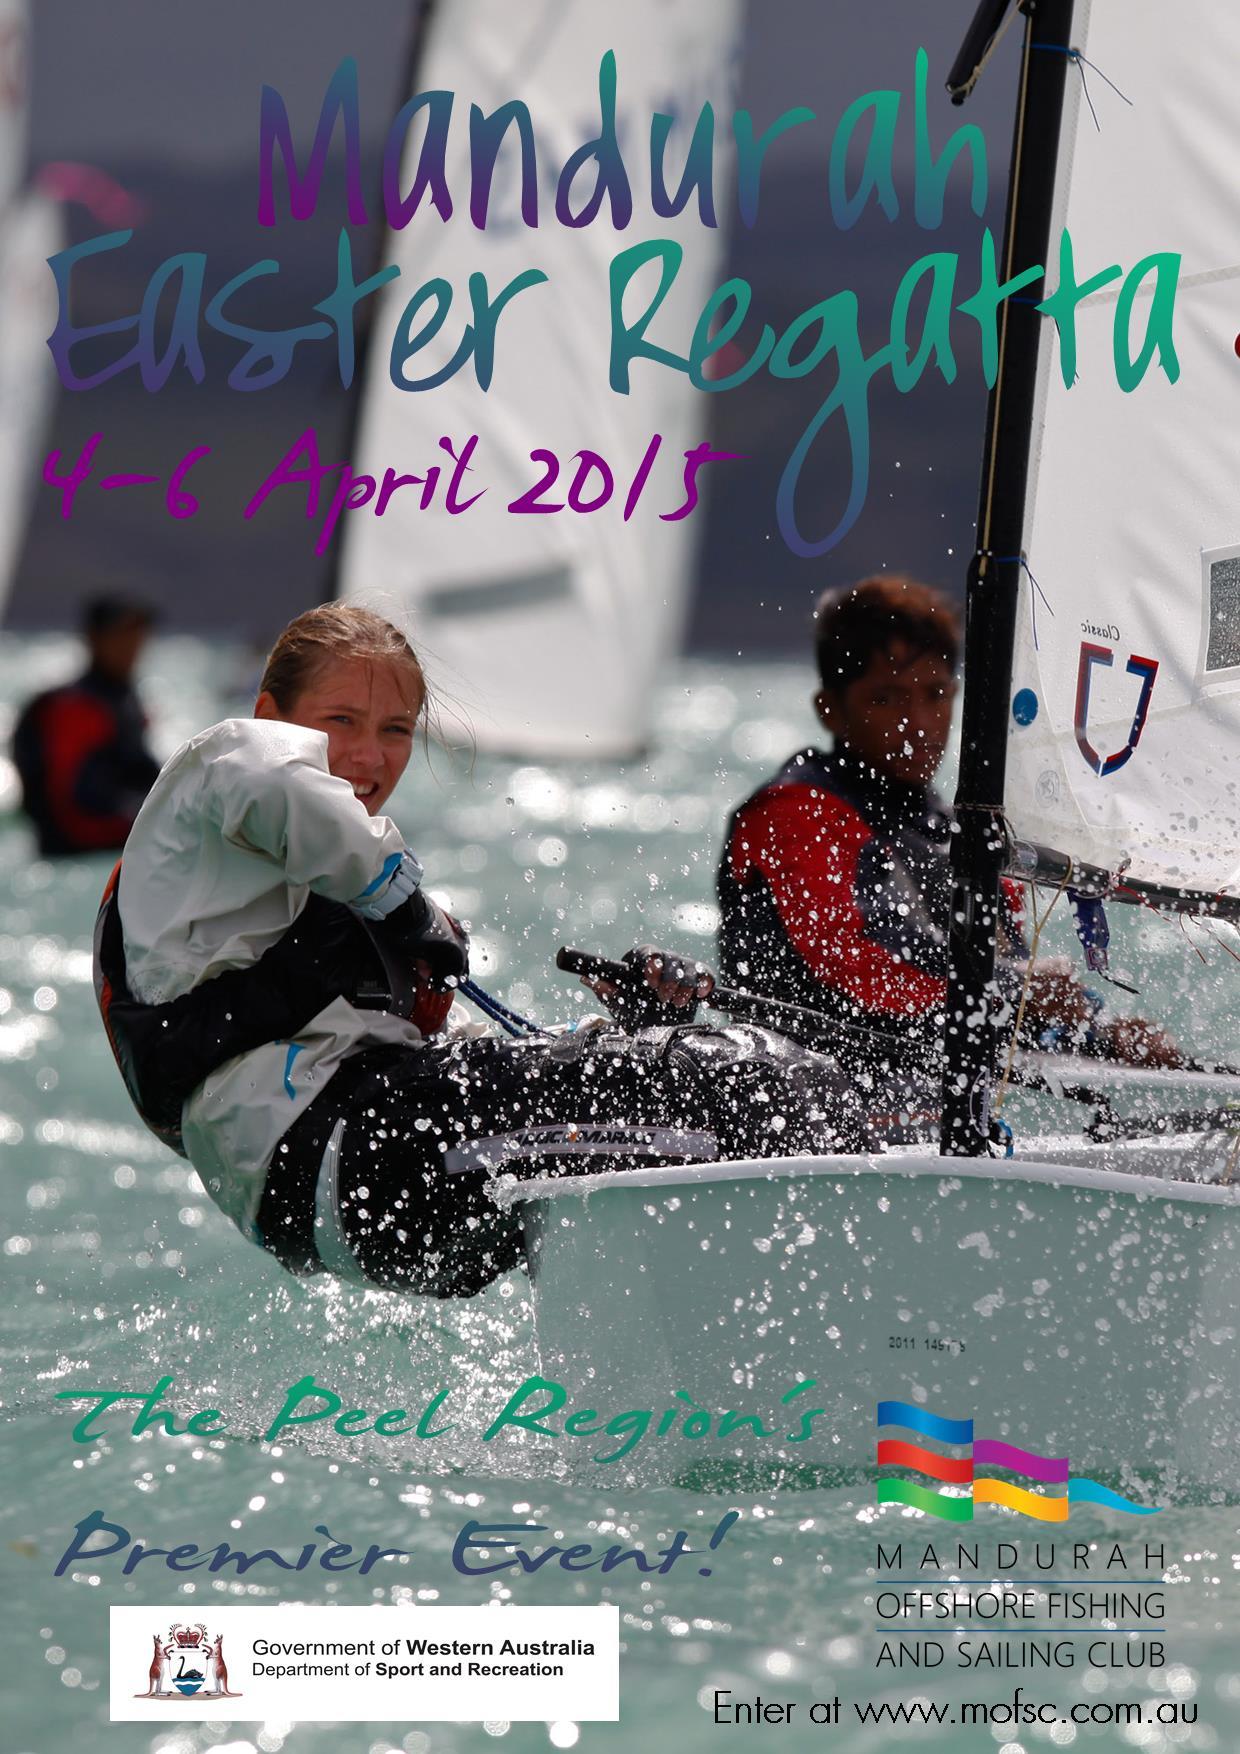 Easter Regatta 2015 Poster